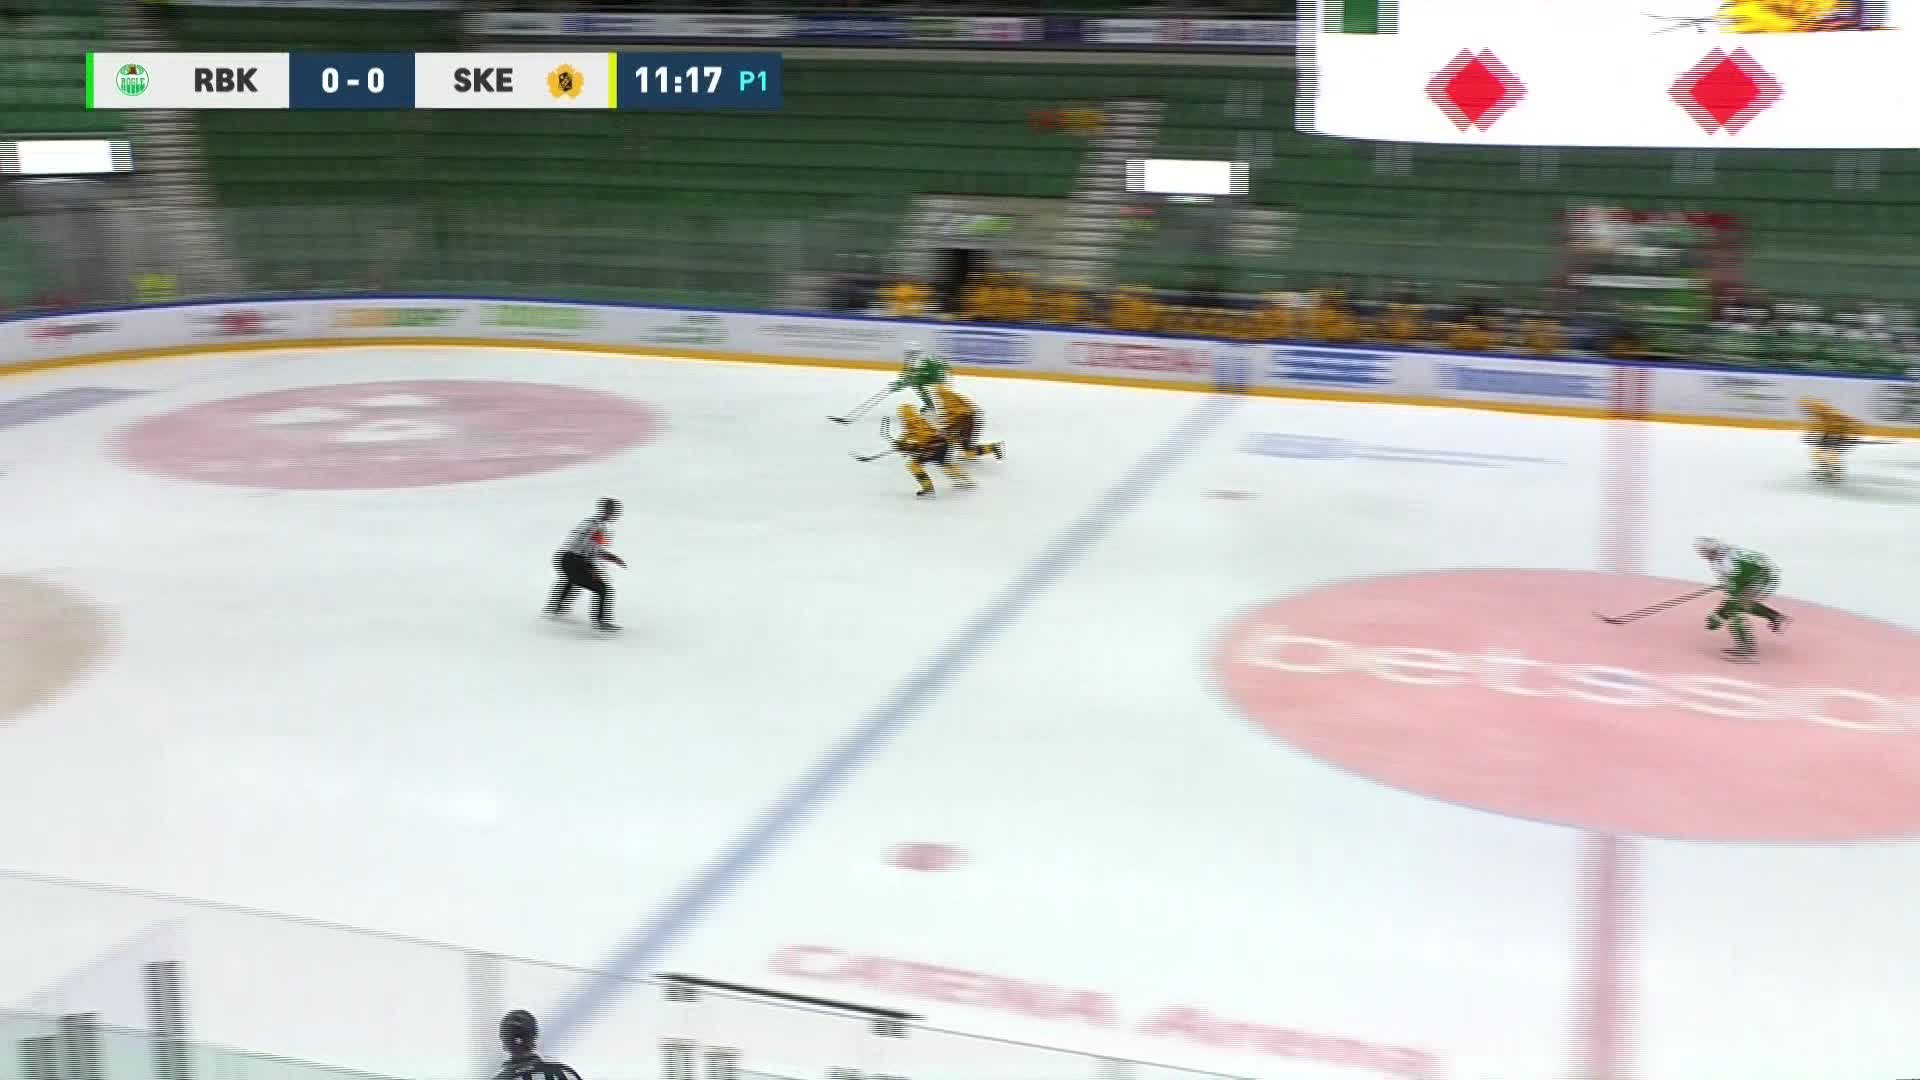 Rögle BK - Skellefteå AIK 1-0